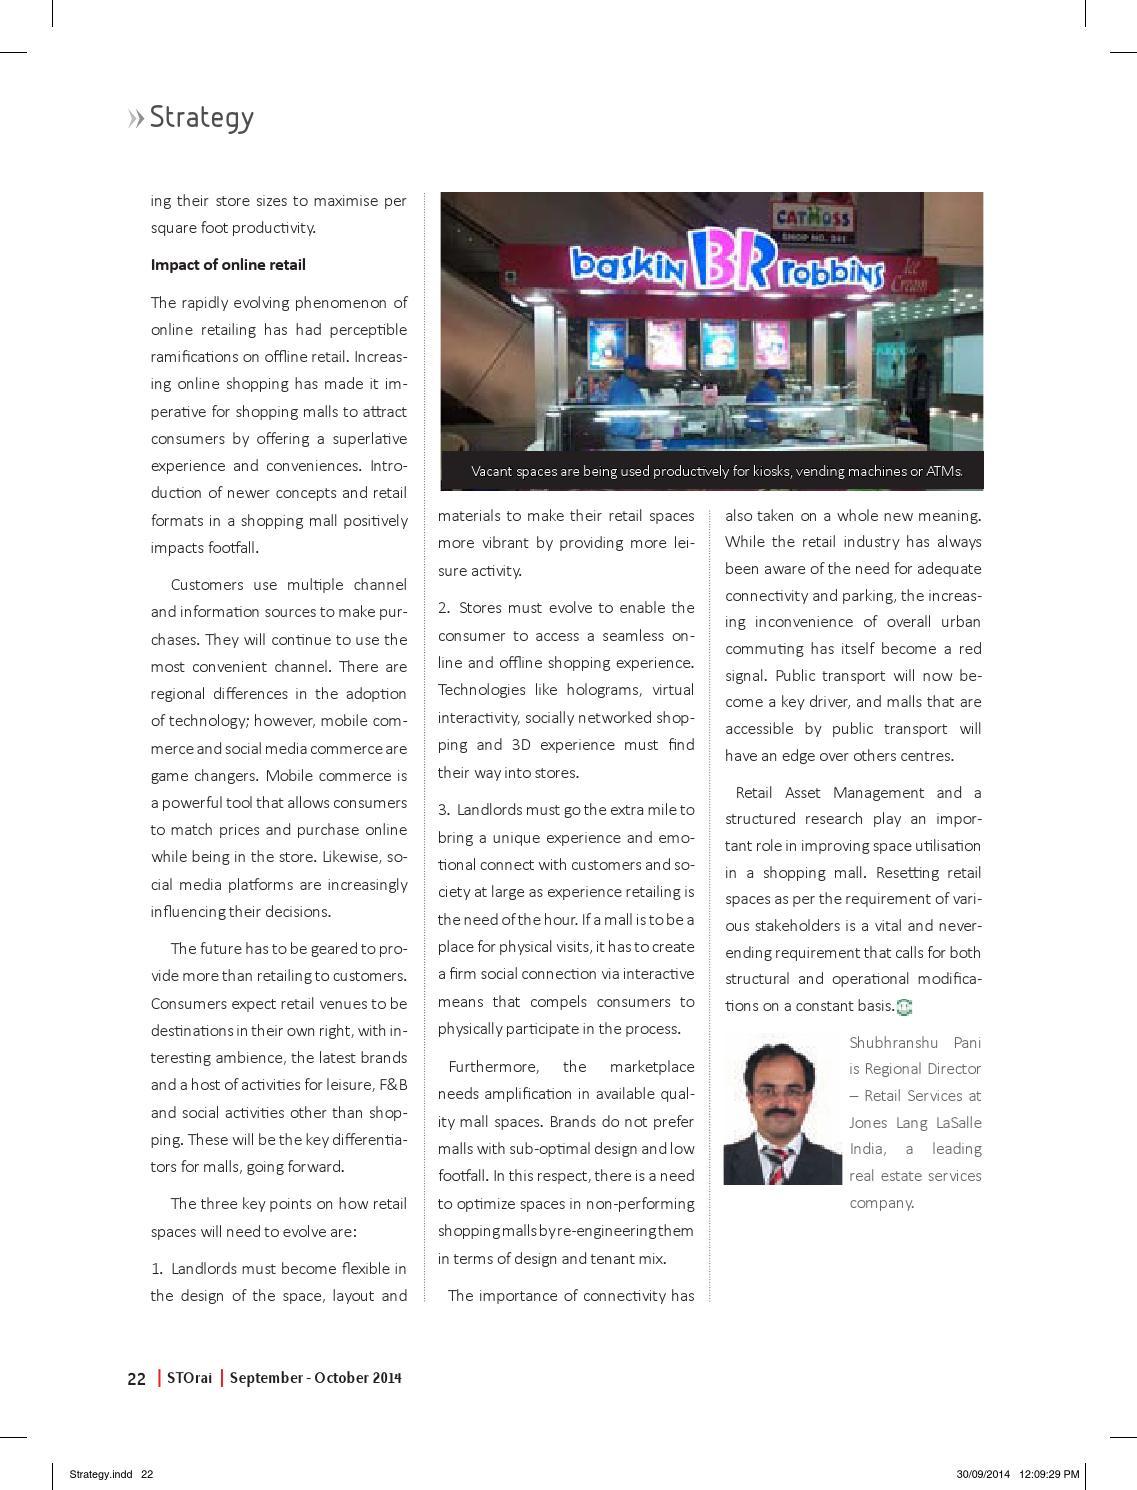 STOrai Magazine: September - October 2014 by Retailers